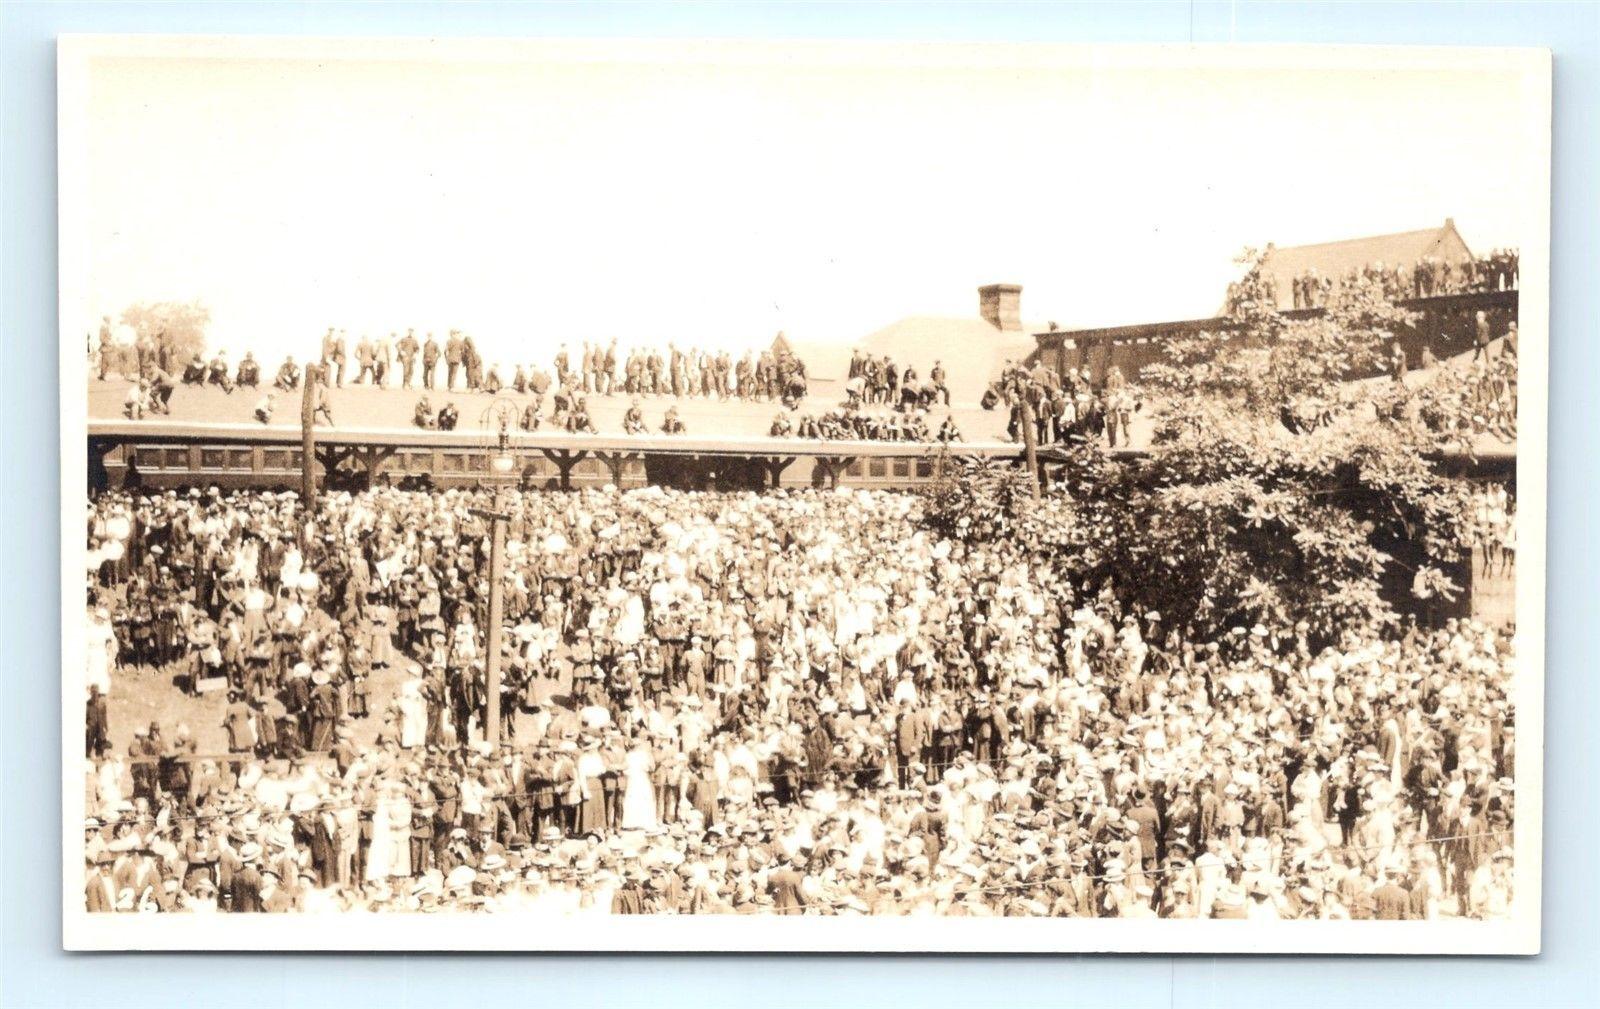 adf432ced18b Postcard MA Springfield Crowd at Train Station Pre 1920s RPPC Real ...